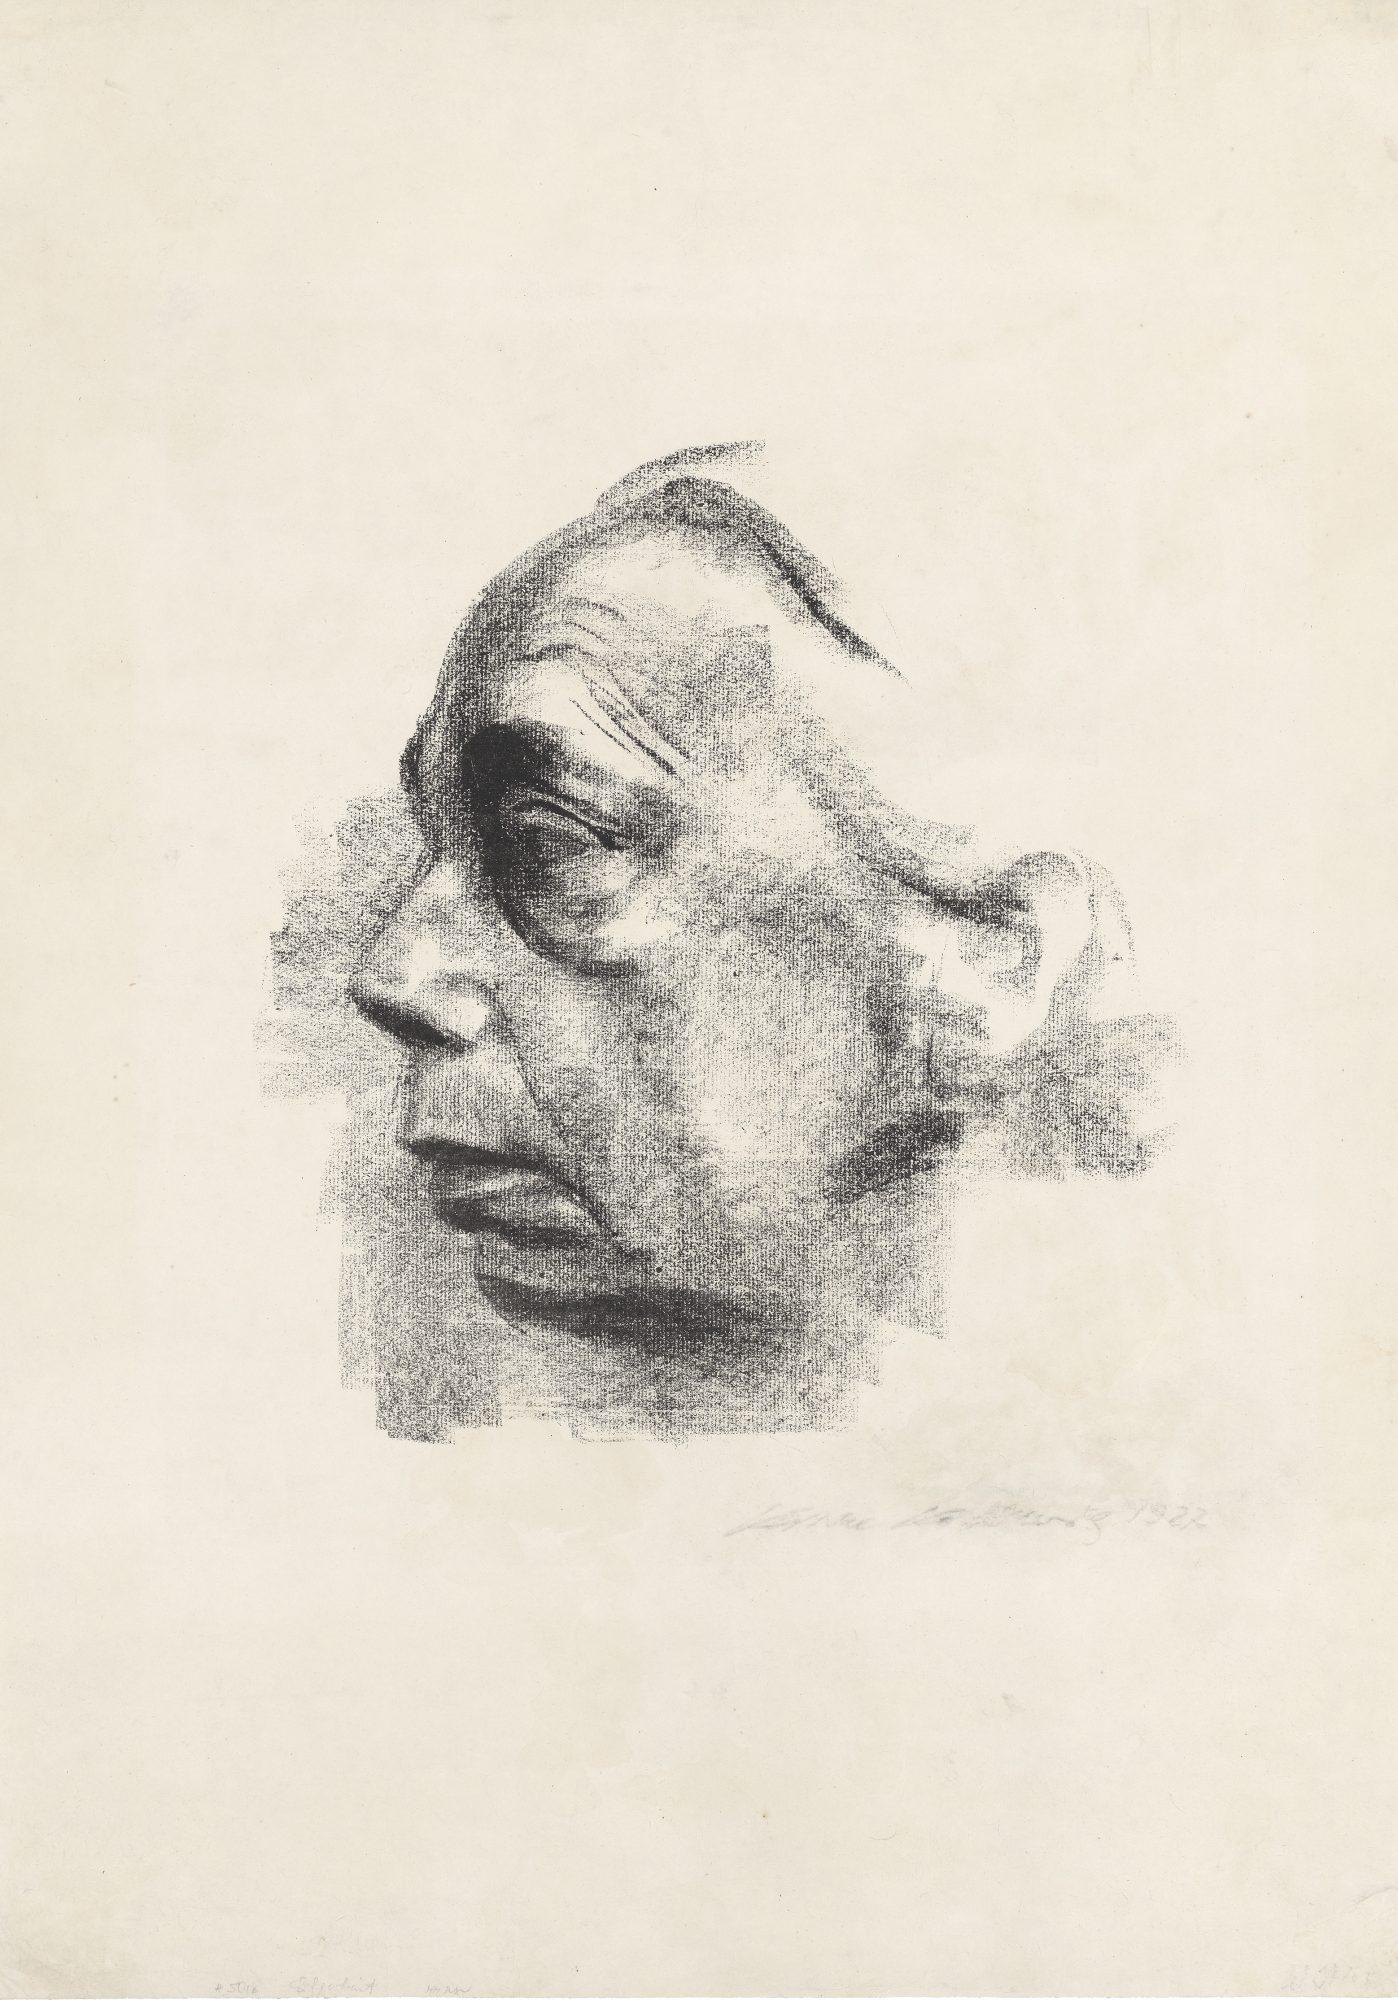 Käthe Kollwitz (German, 1867-1945) Selbstbildnis im Profil (Self-Portrait in Profile)